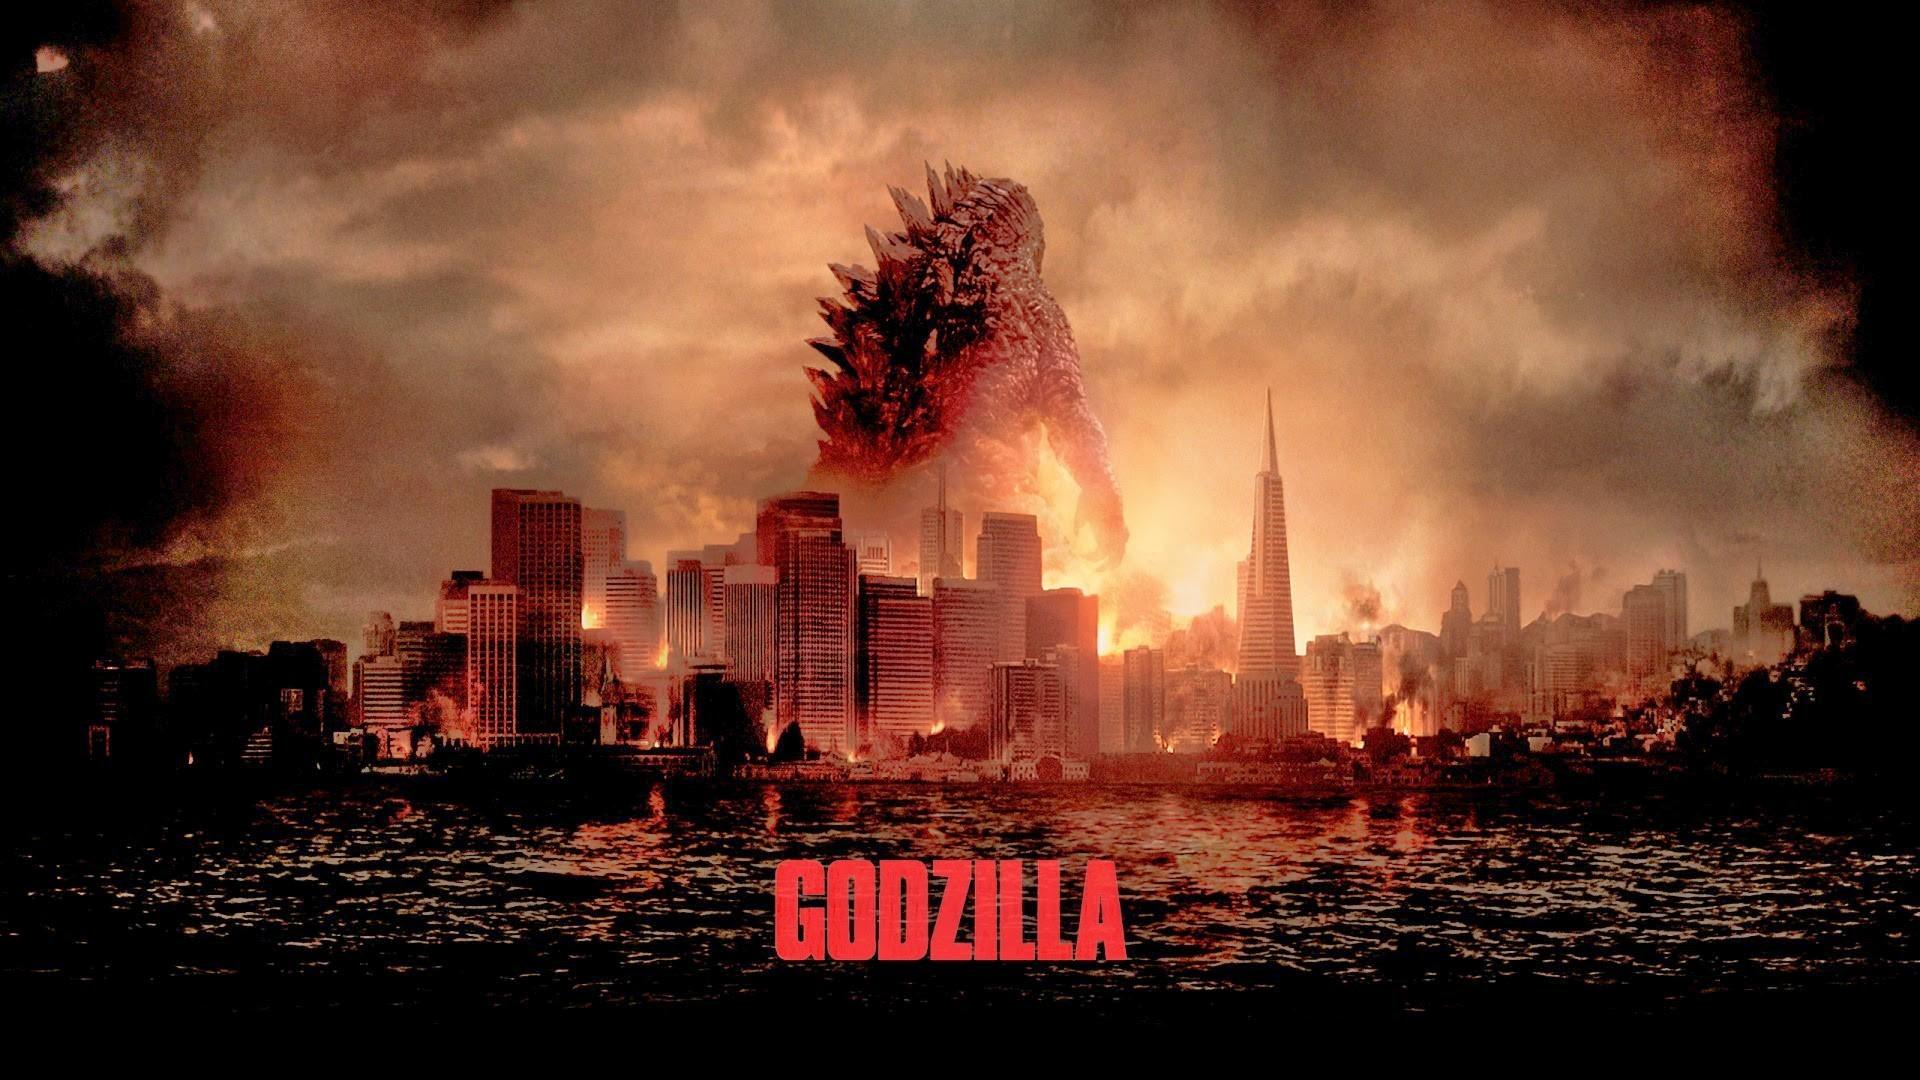 Download New Godzilla Movie Wallpaper Backgrounds Hd 1920x1080px